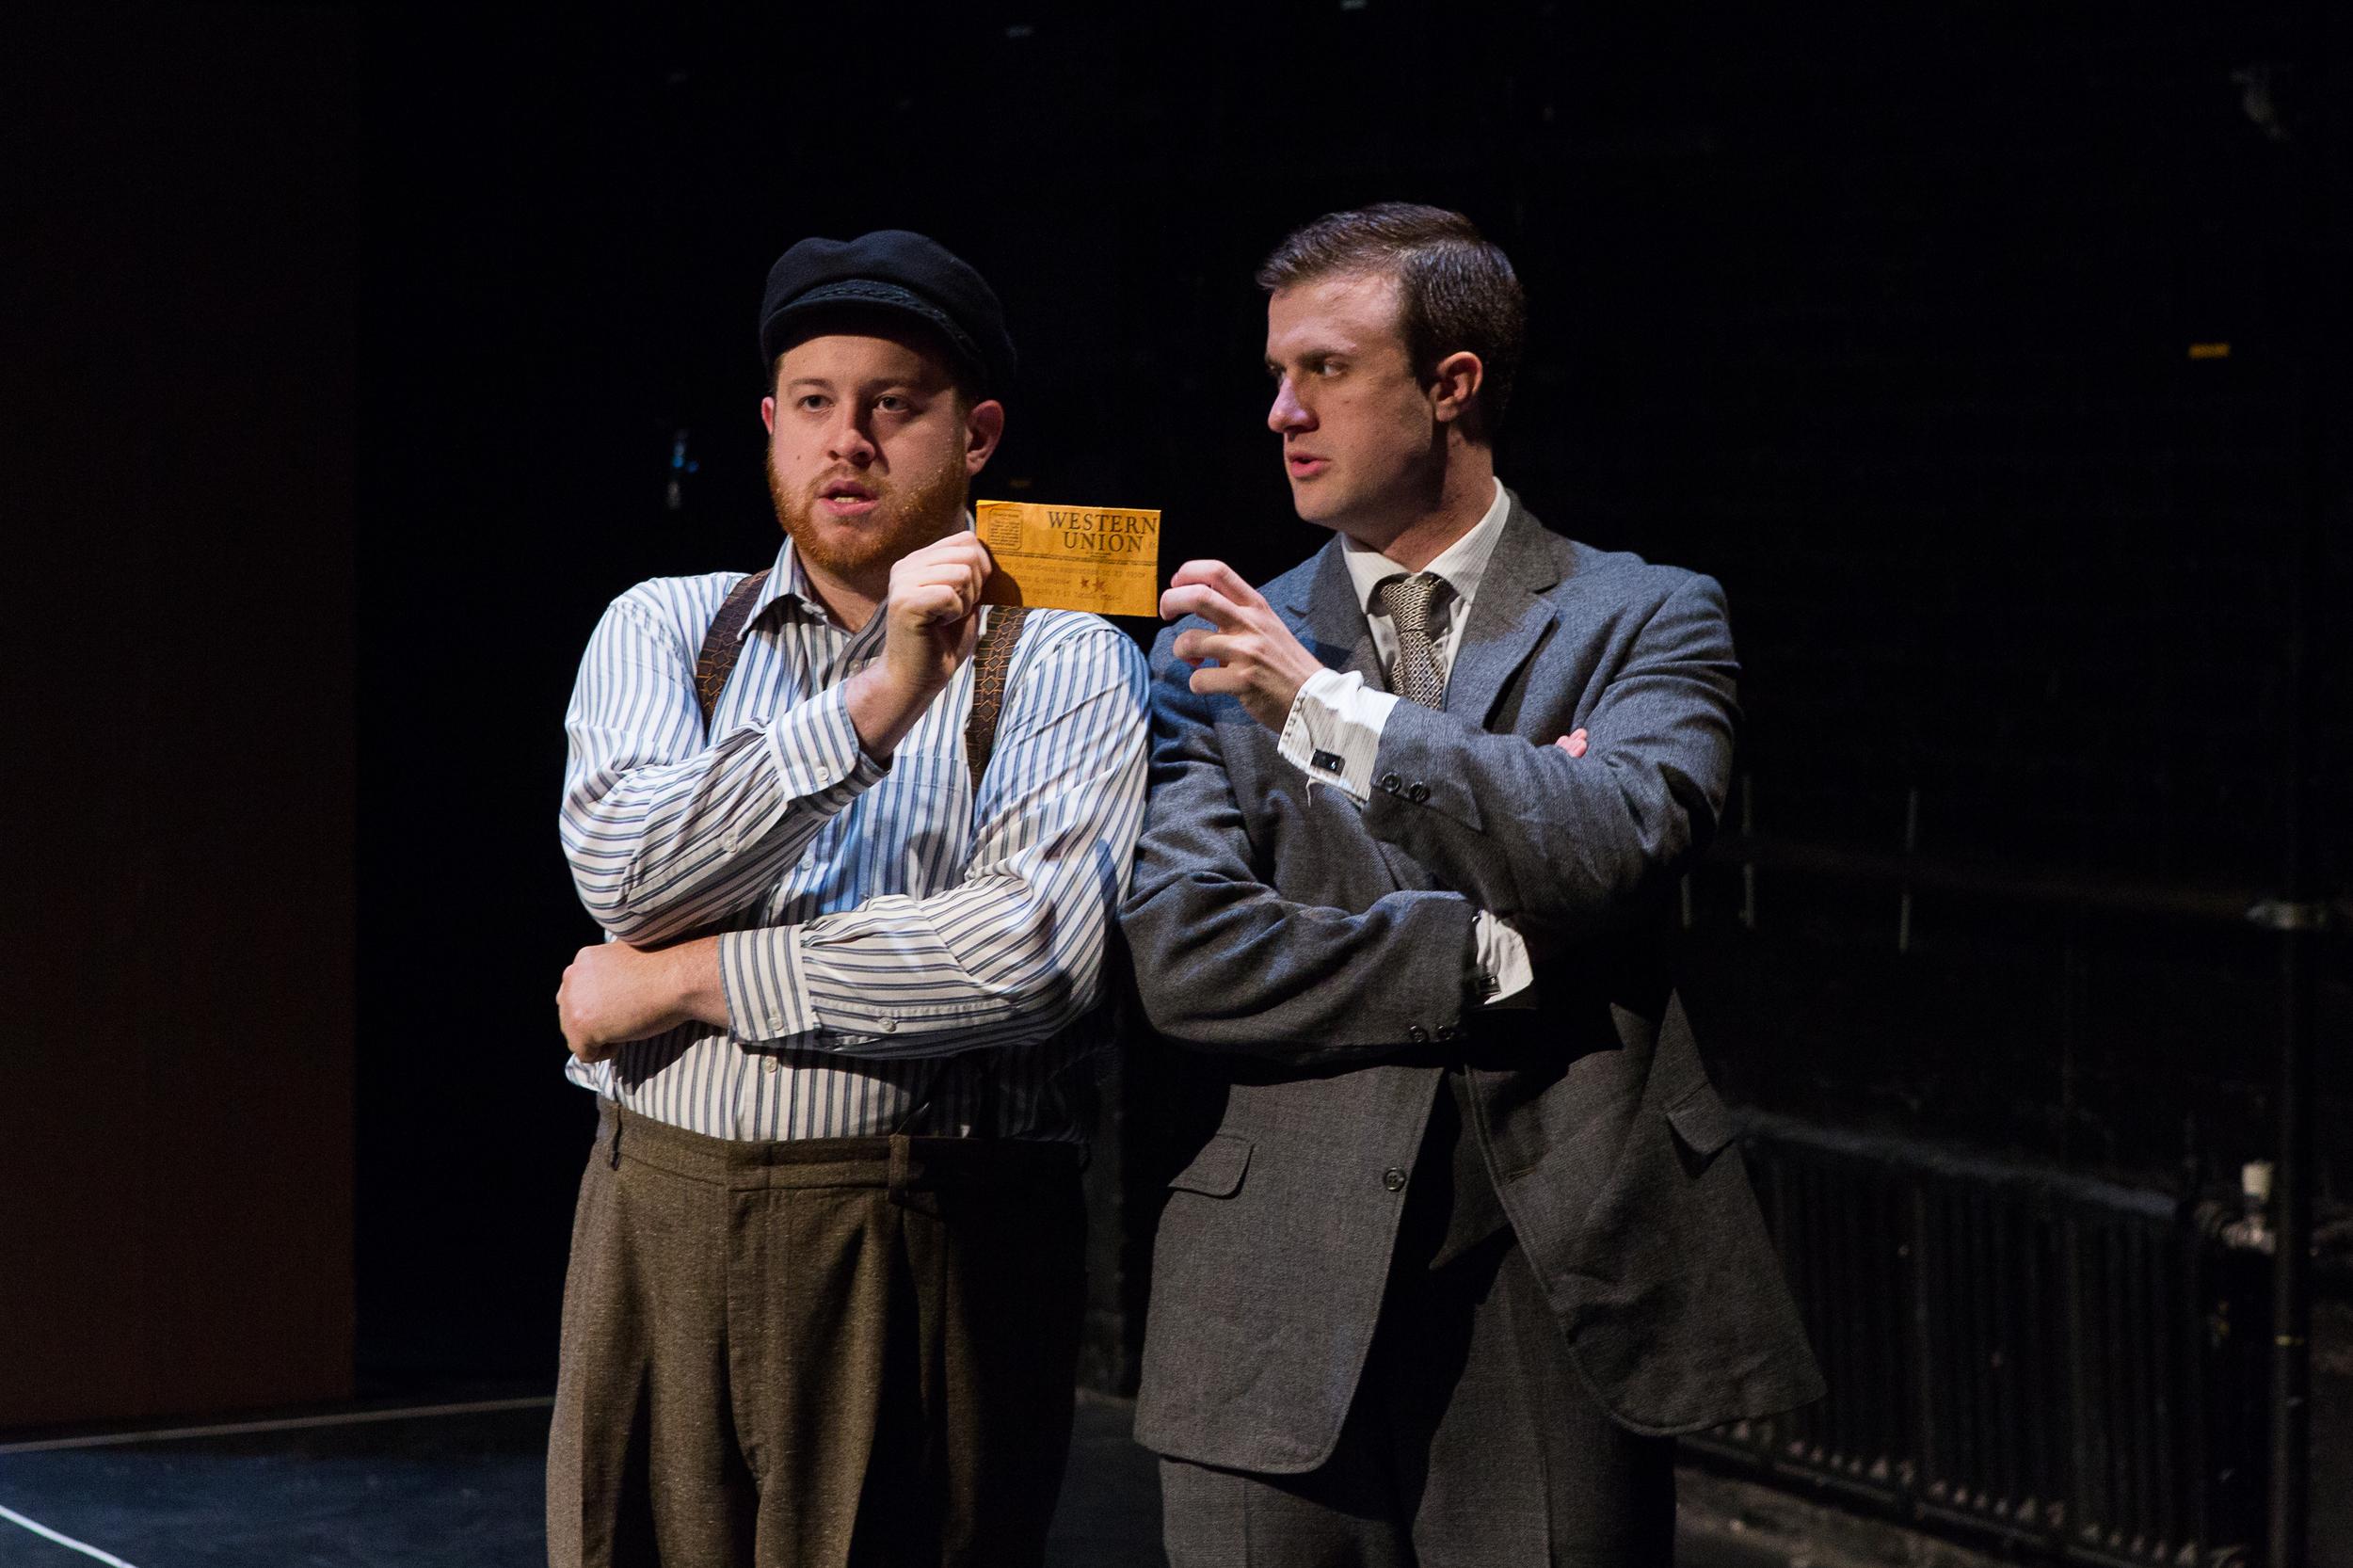 Trey K. Blackburn (sailor) & Paul Frederick in Hamlet ; directed by Brad Raimondo, photo by Scott Wynn